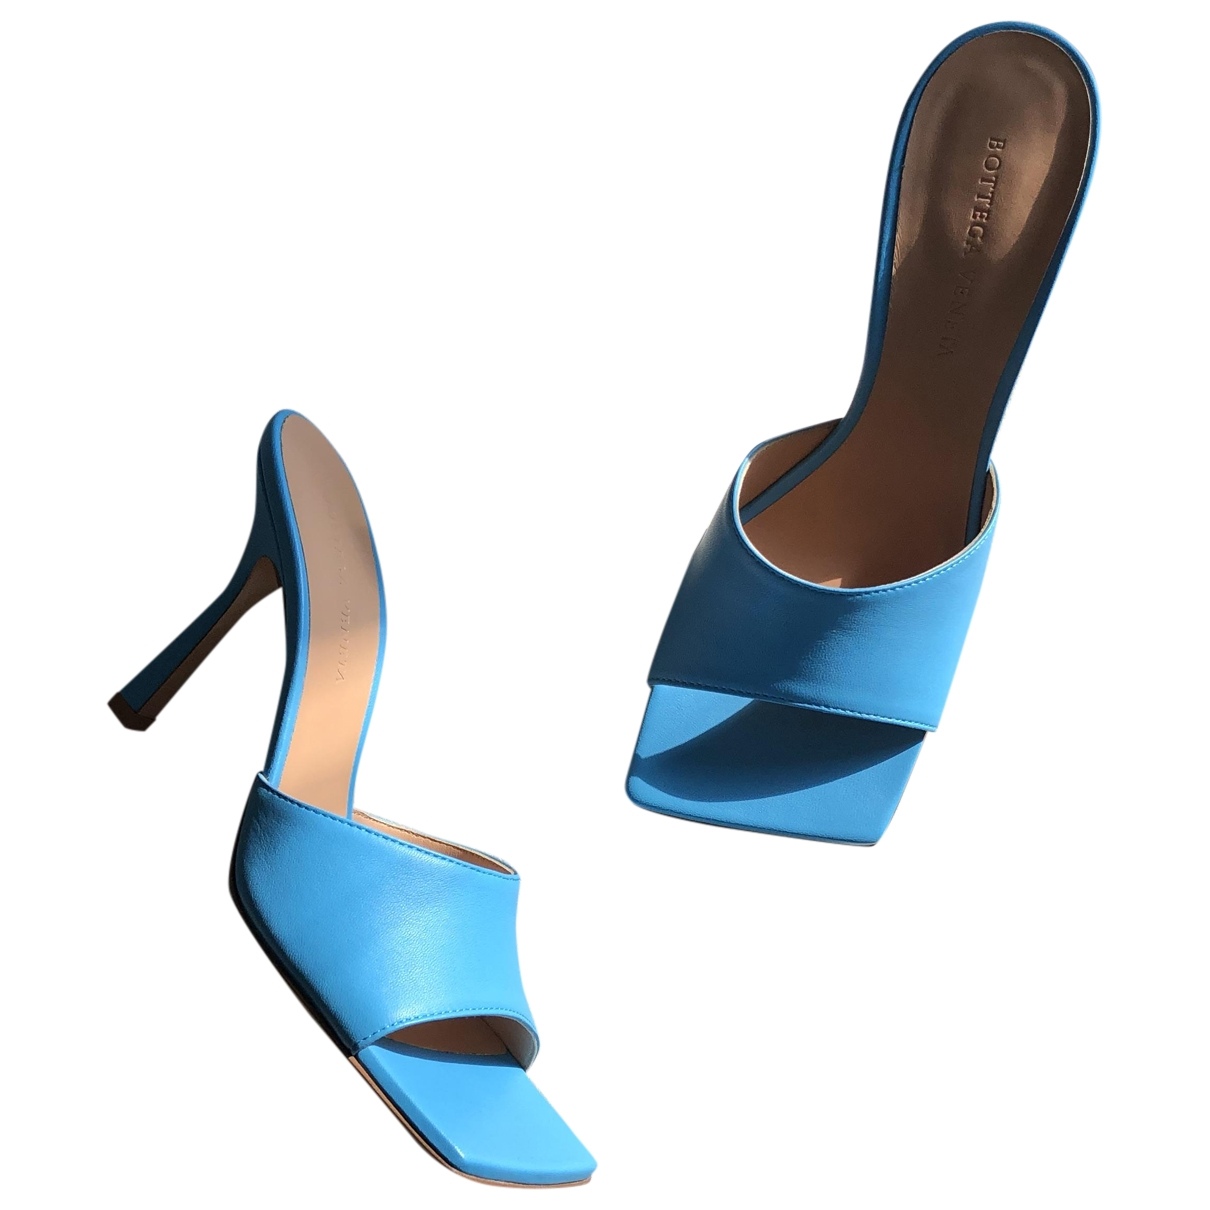 Bottega Veneta - Sandales Stretch pour femme en cuir - bleu